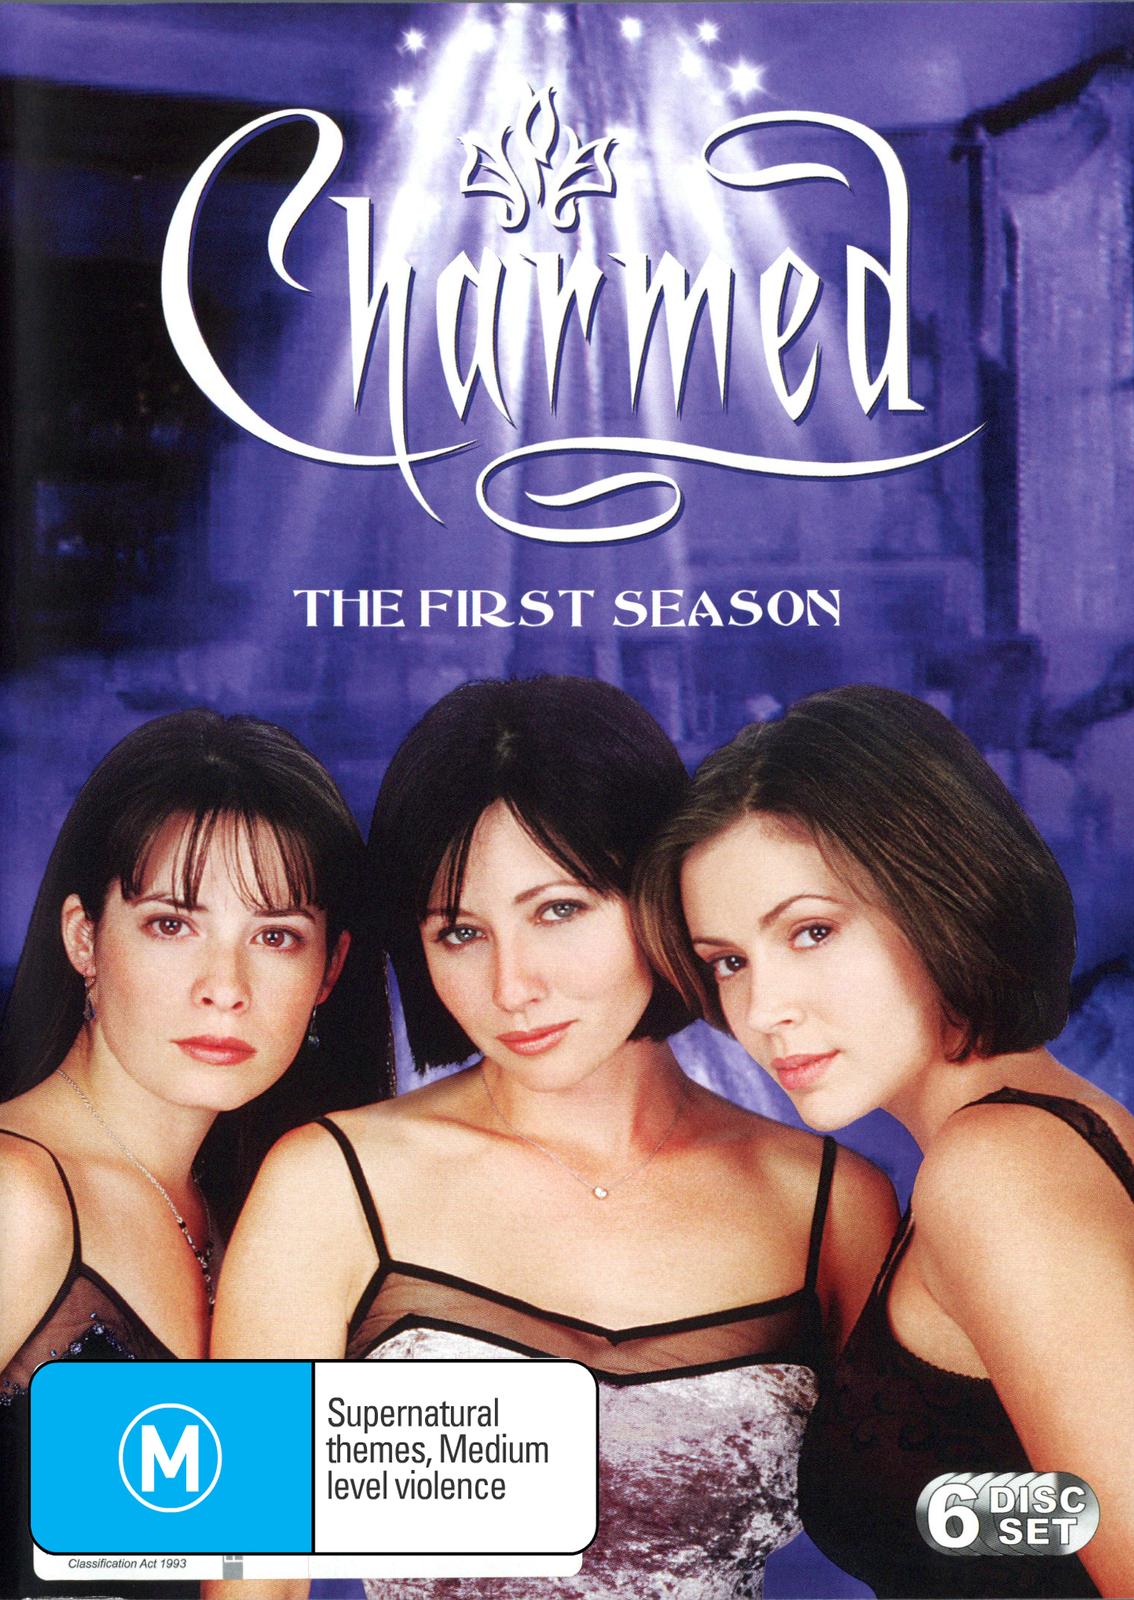 Charmed - Complete 1st Season (6 Disc Set) on DVD image